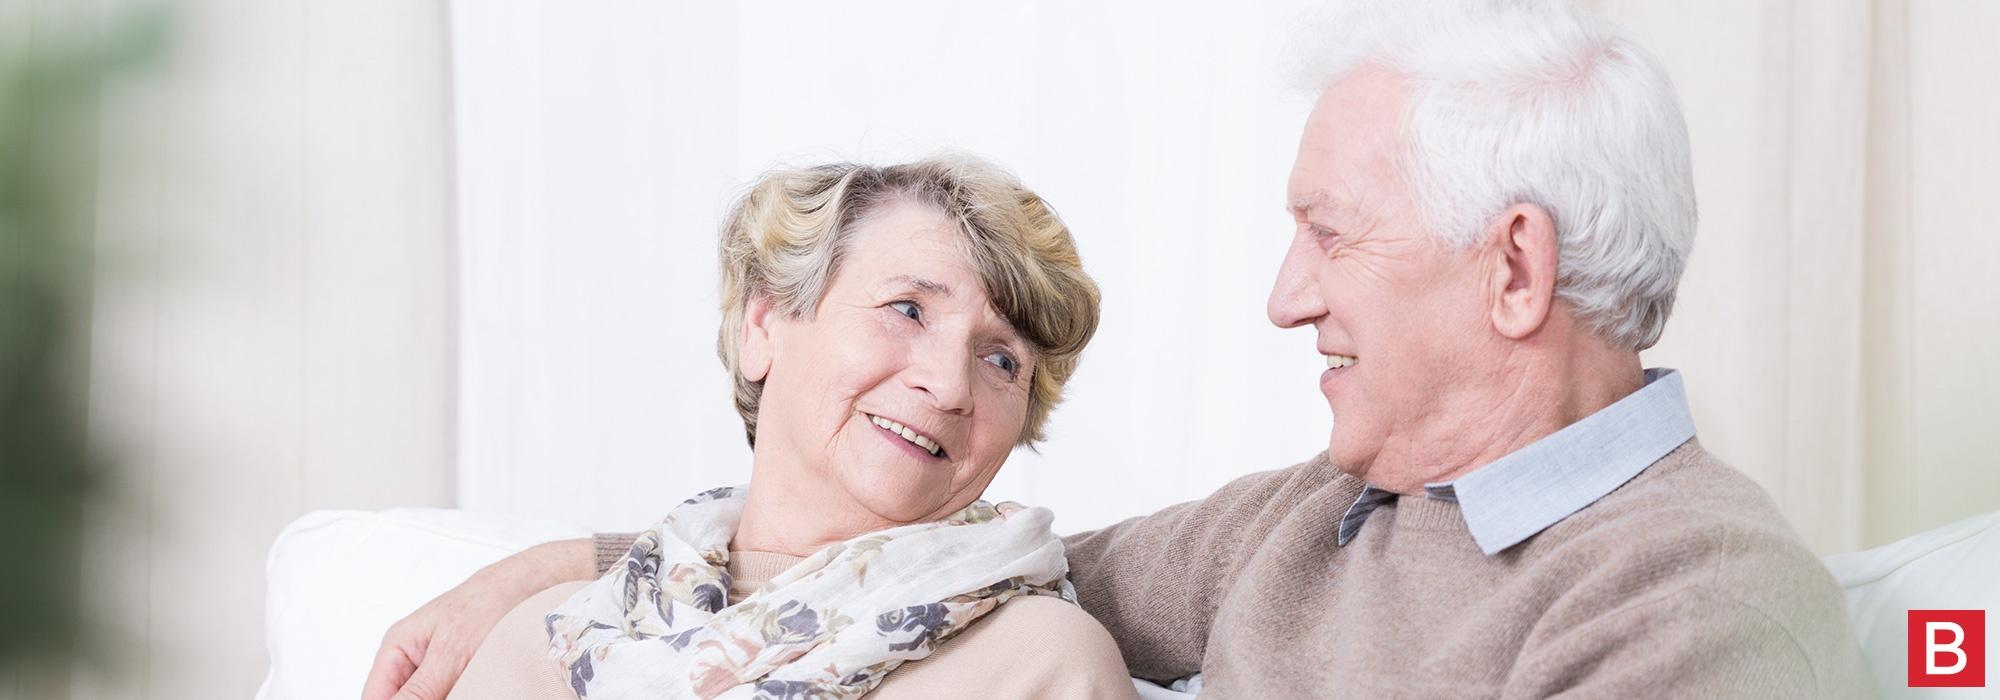 Senior-dating-a-new-world-of-fun-2000x700.jpg